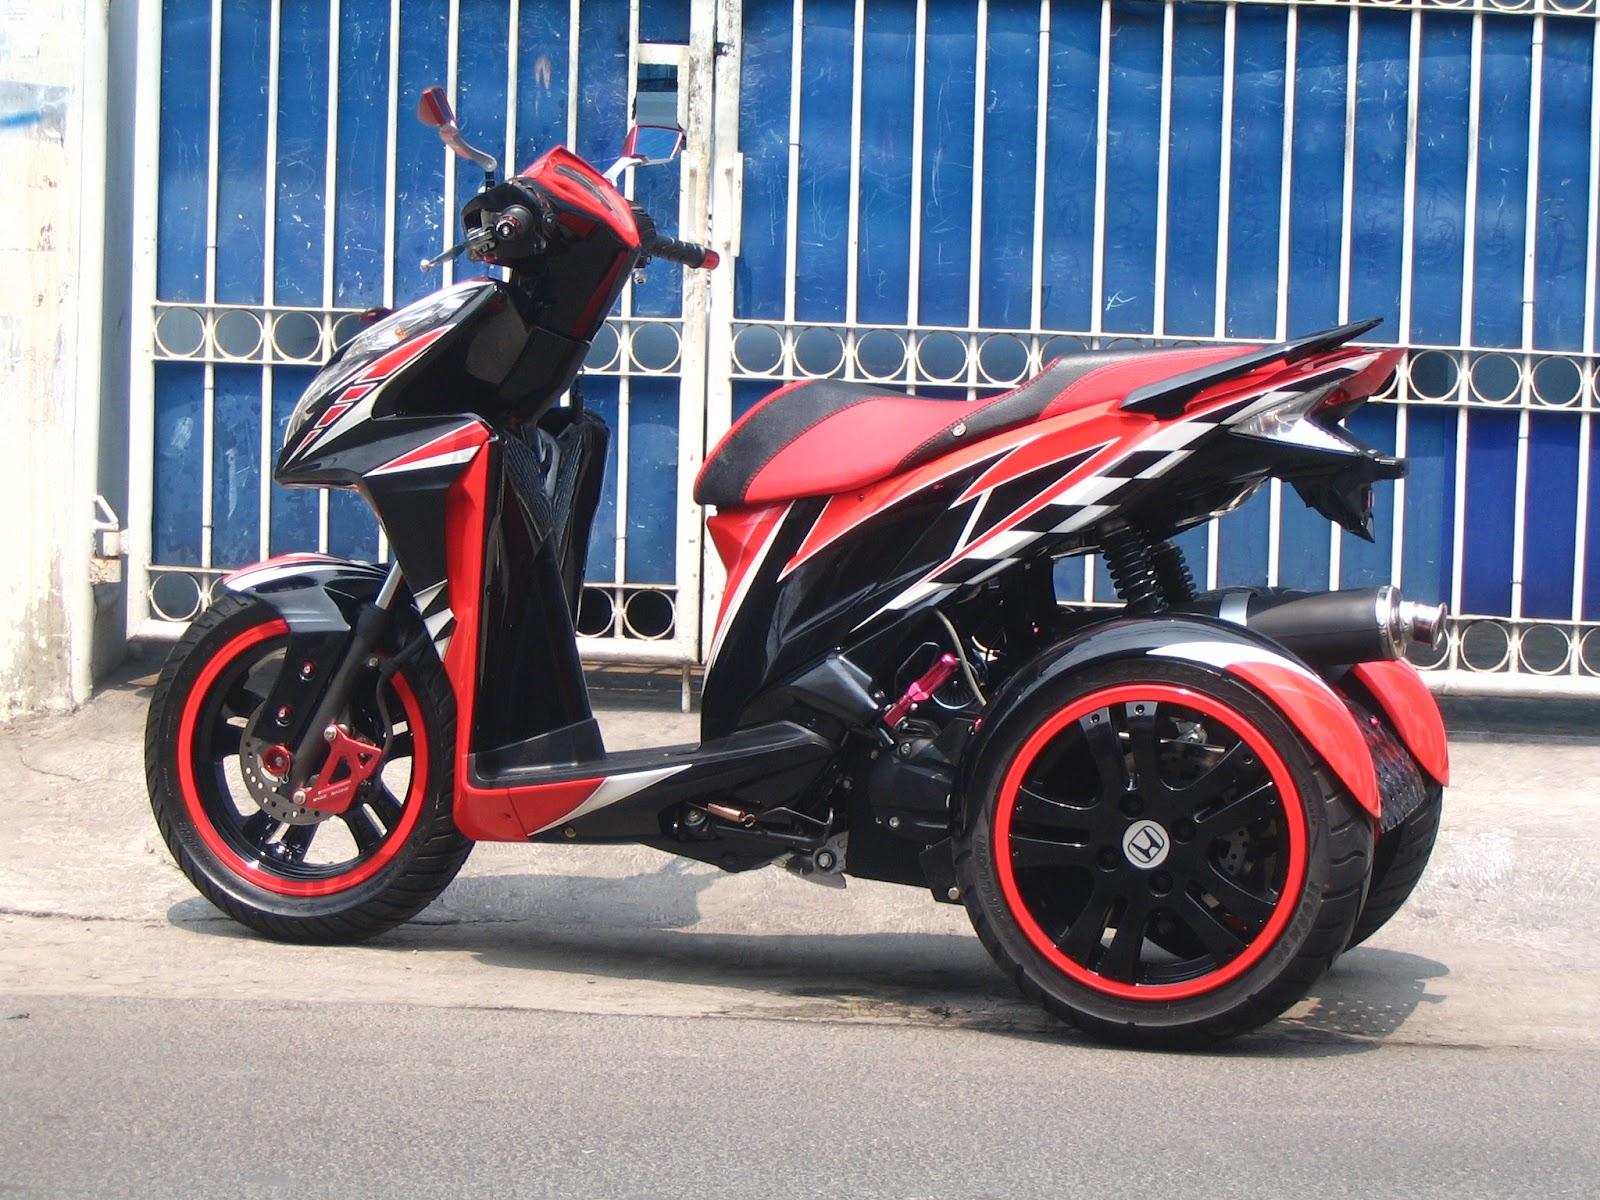 Modifikasi JOK MOTOR Jok Motor Vario Roda Pesanan Mr Nandang